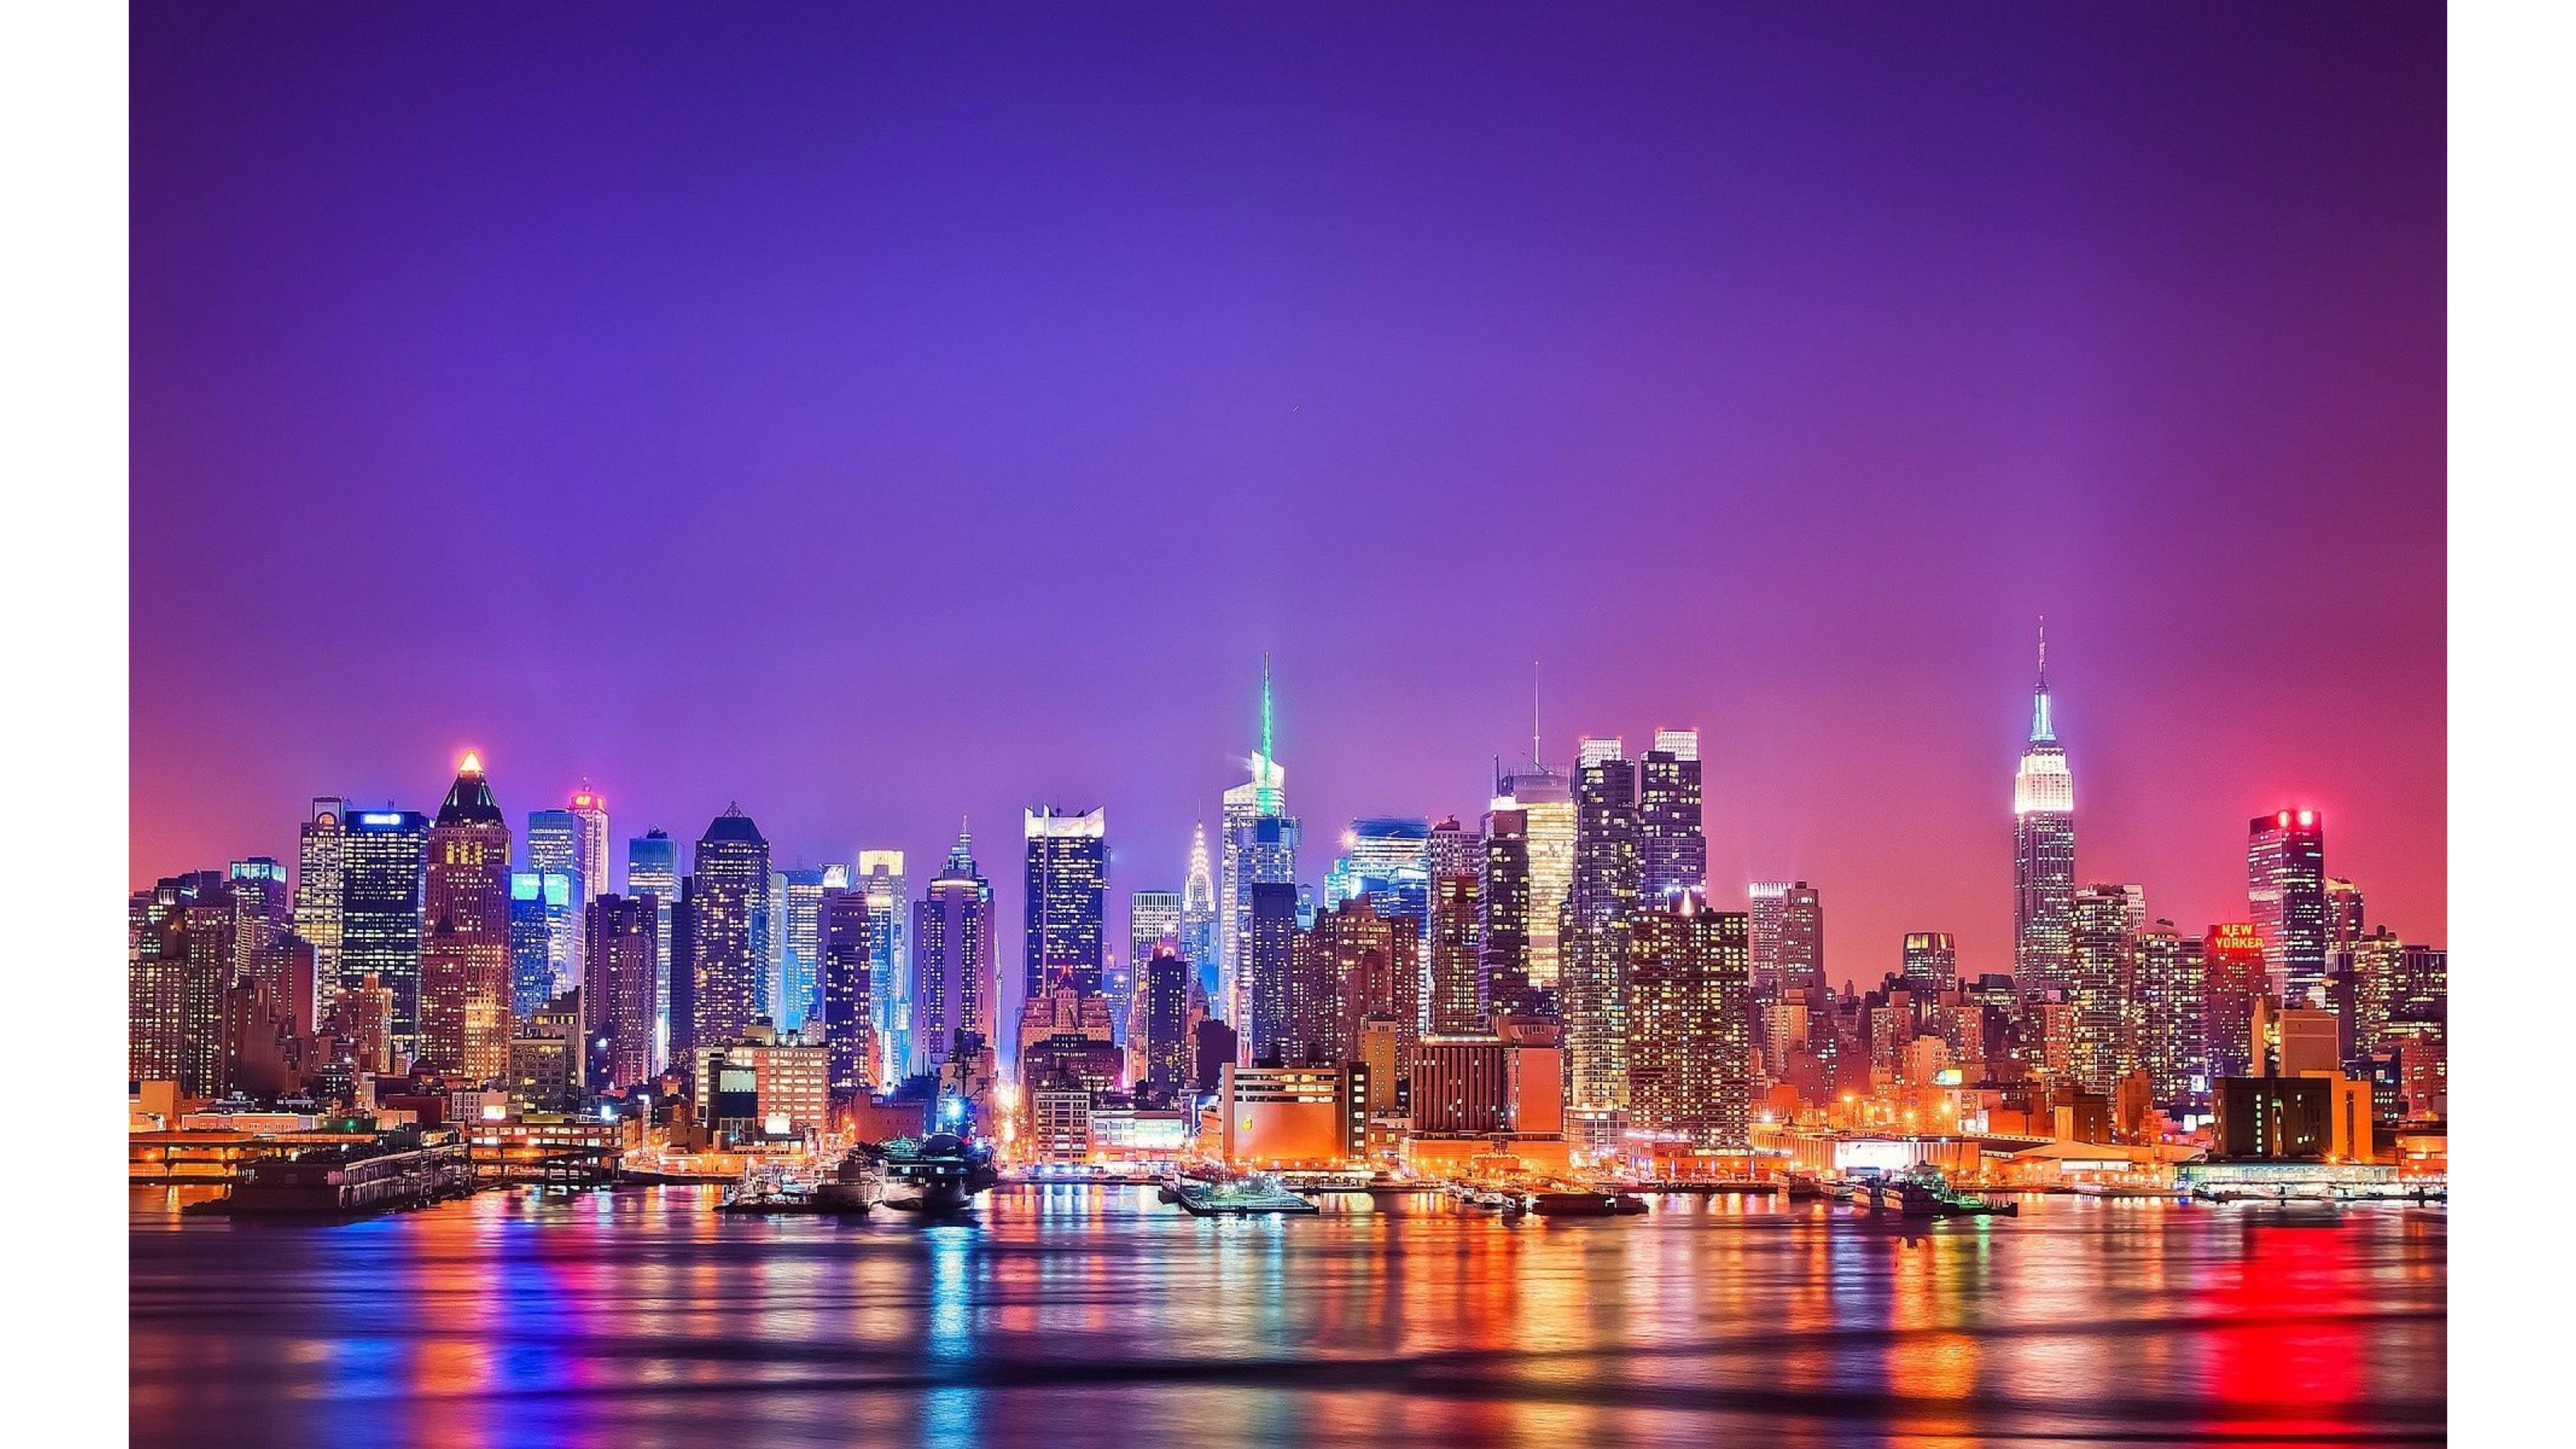 new 4k wallpaper,cityscape,city,skyline,metropolitan area,metropolis